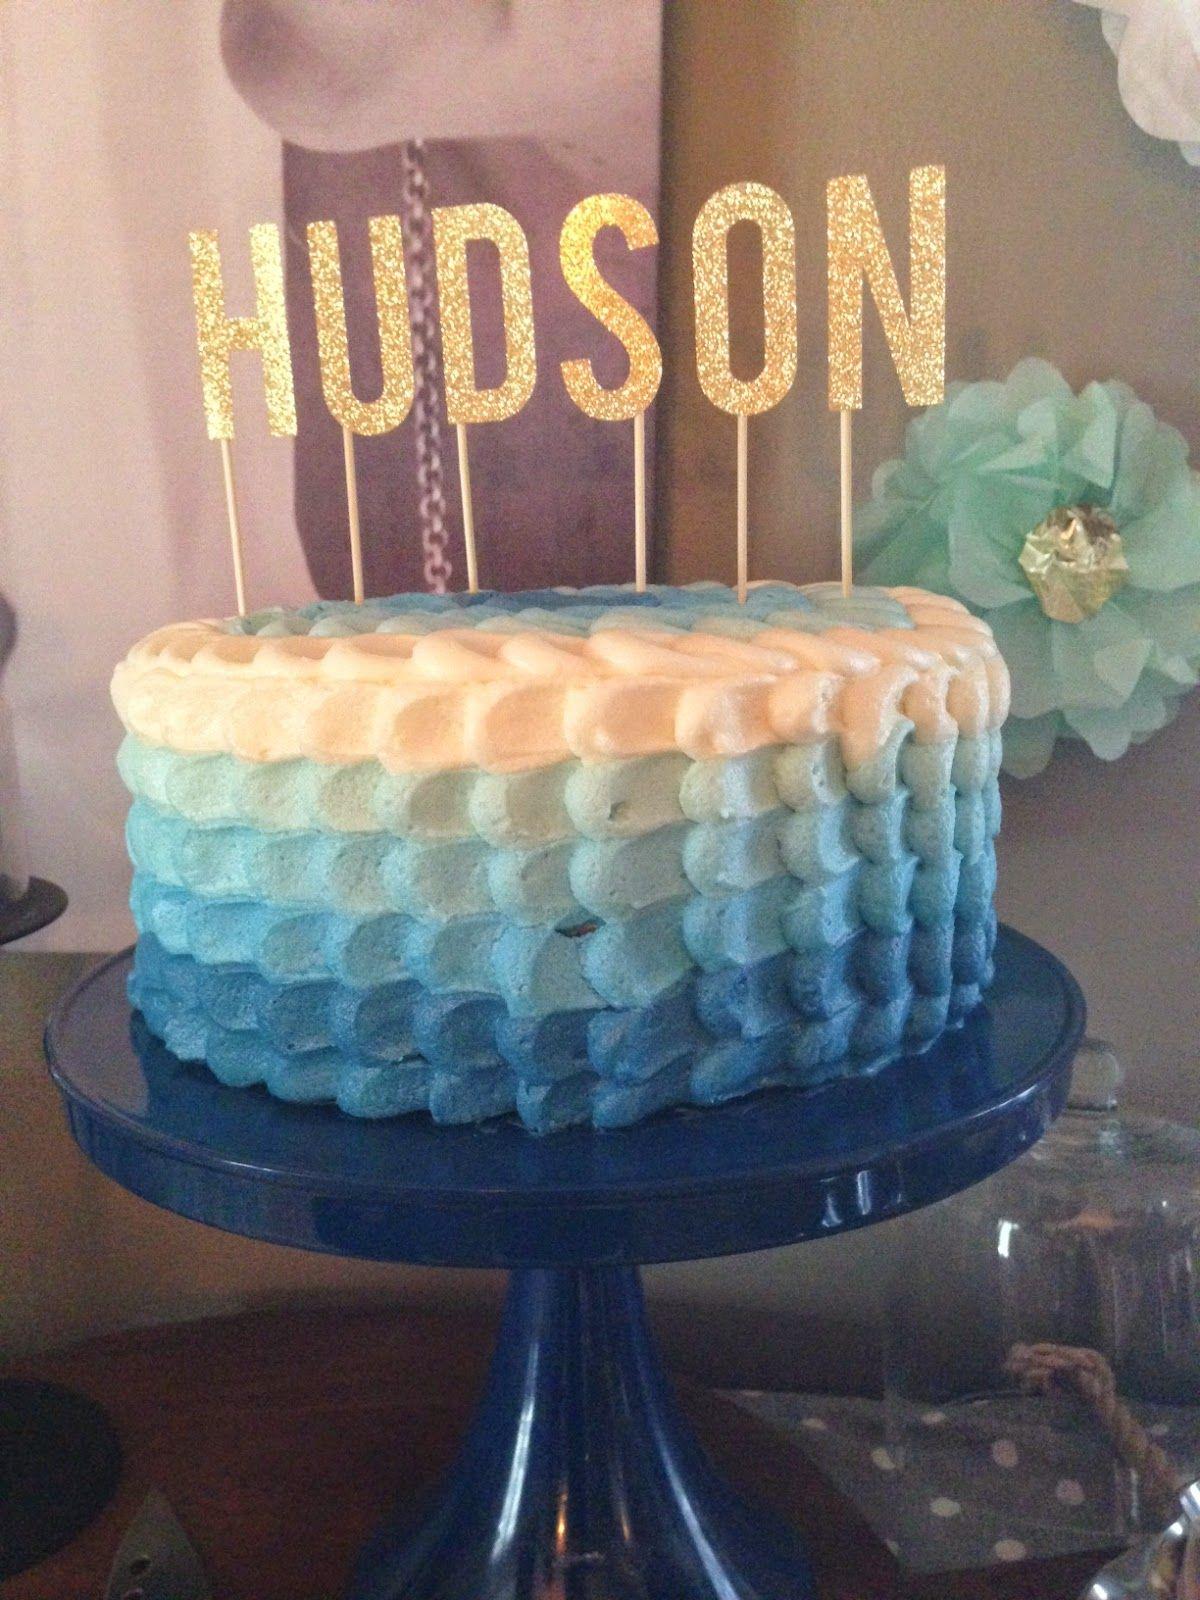 1st birthday cake petal icing glitter letter cake toppers hard